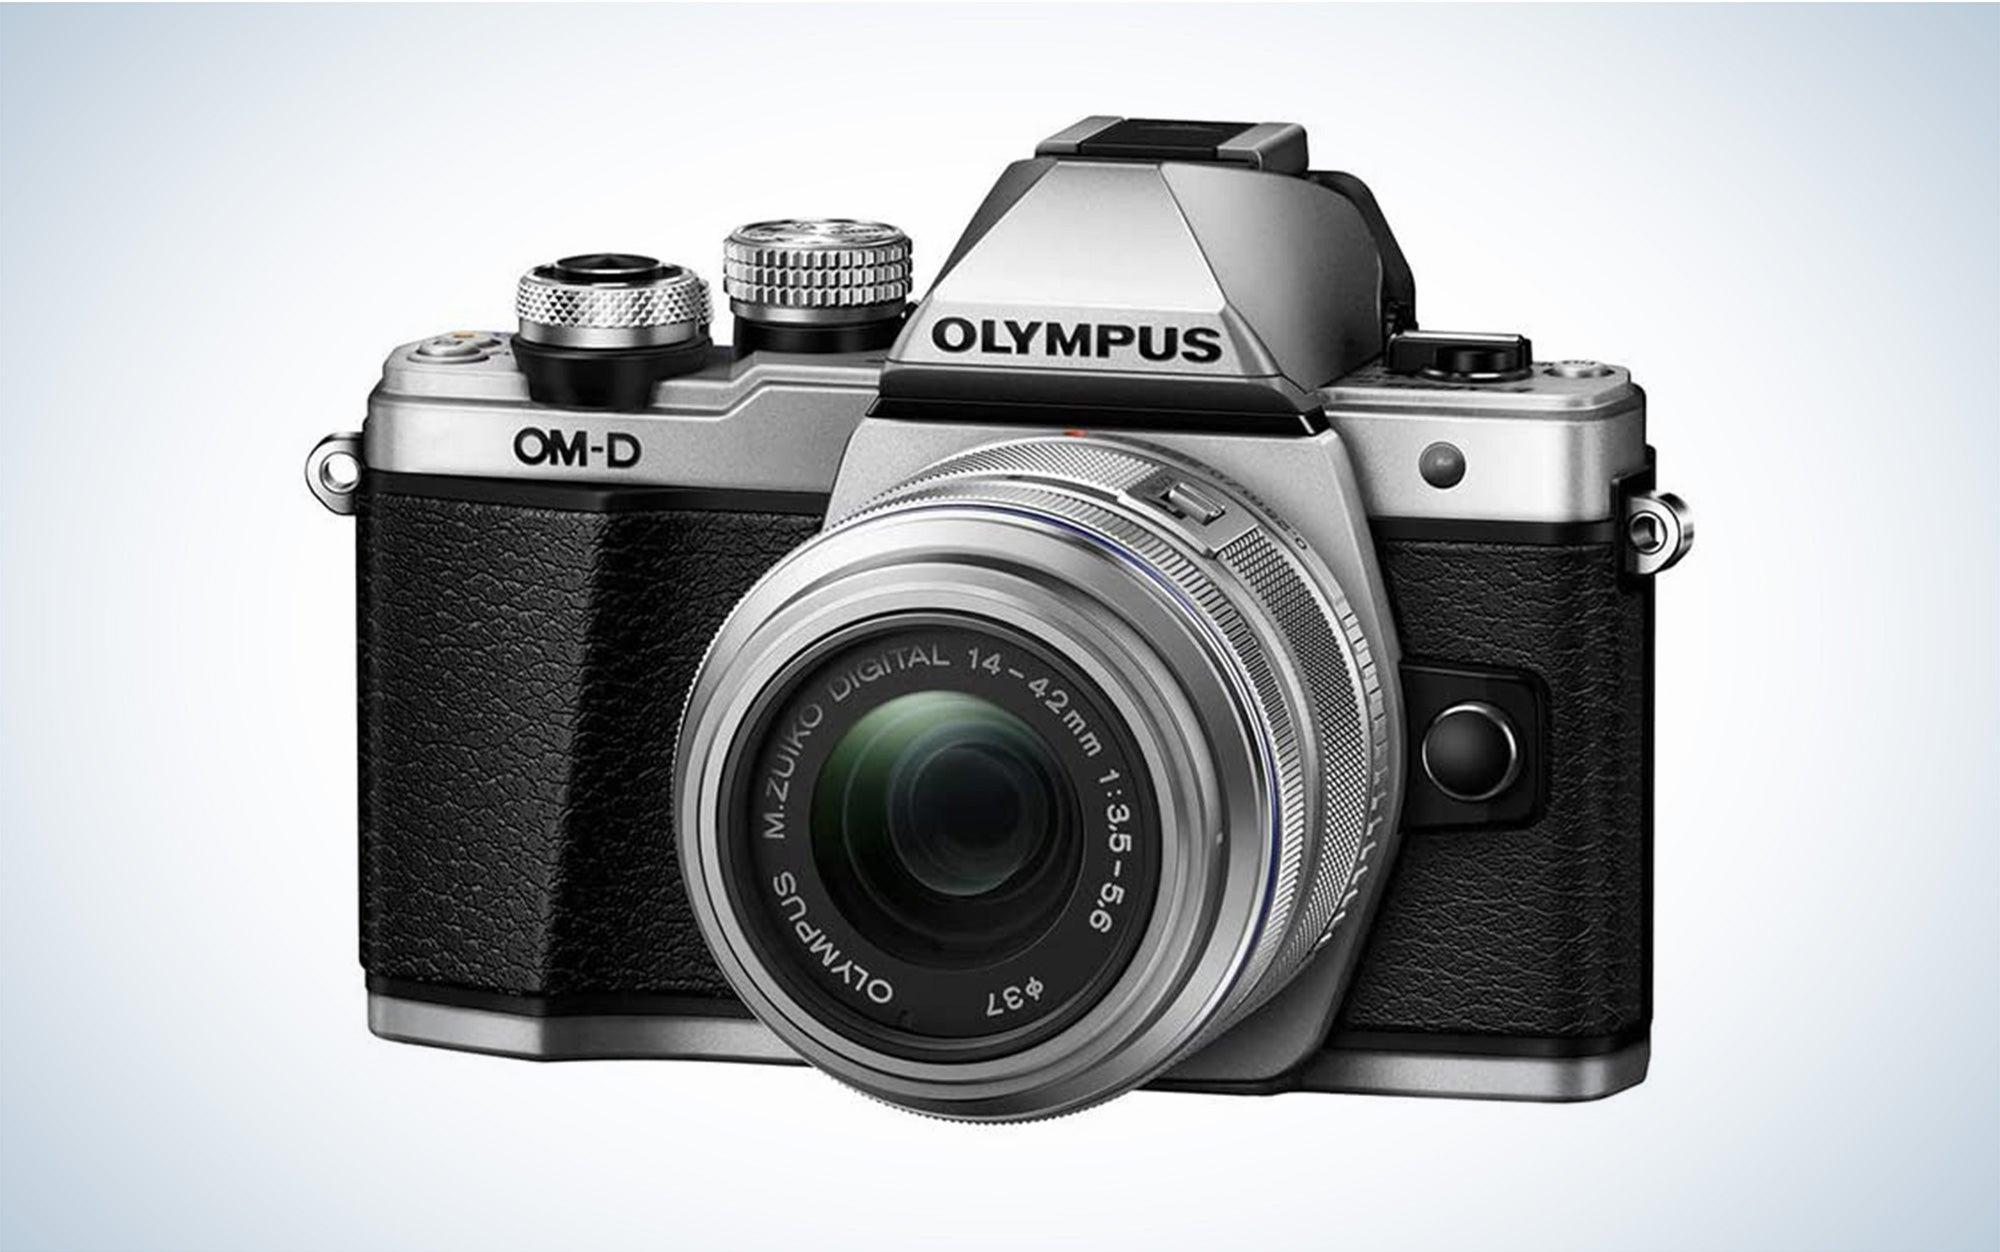 Best mirrorless camera for beginners: Olympus OM-D E-M10 Mark IV